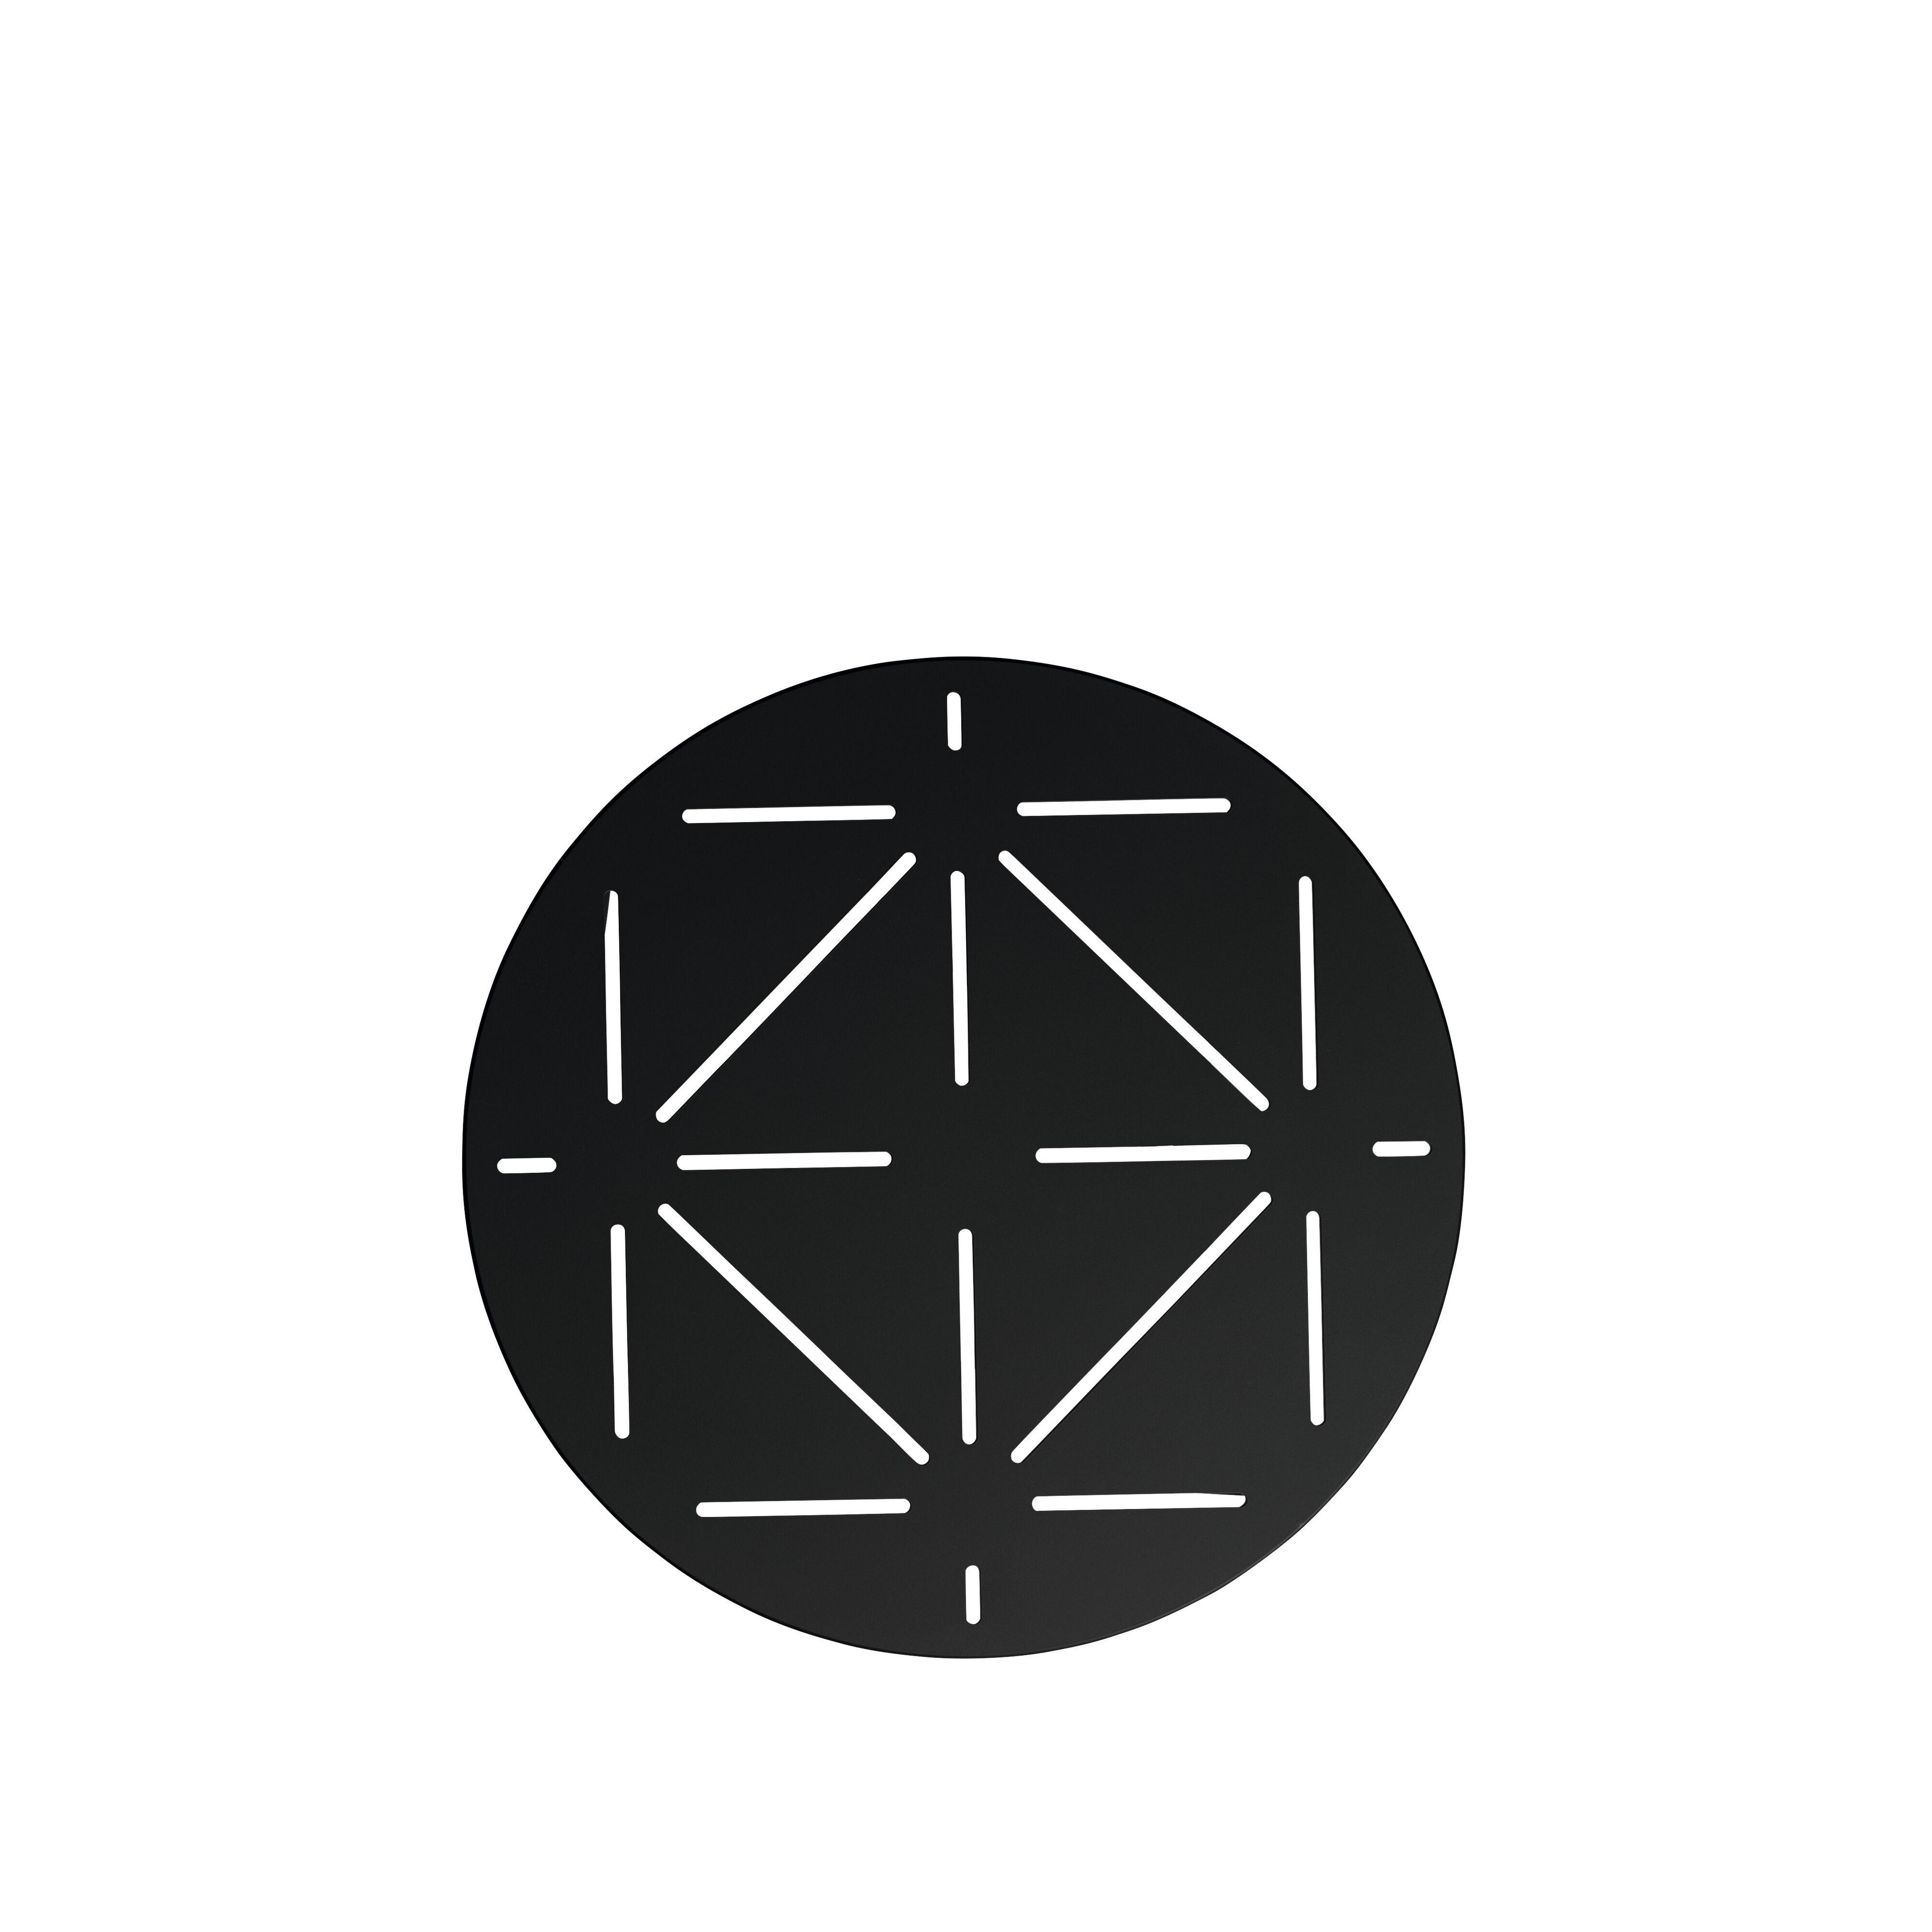 02-WK-Joco-0009_matt-H.tif